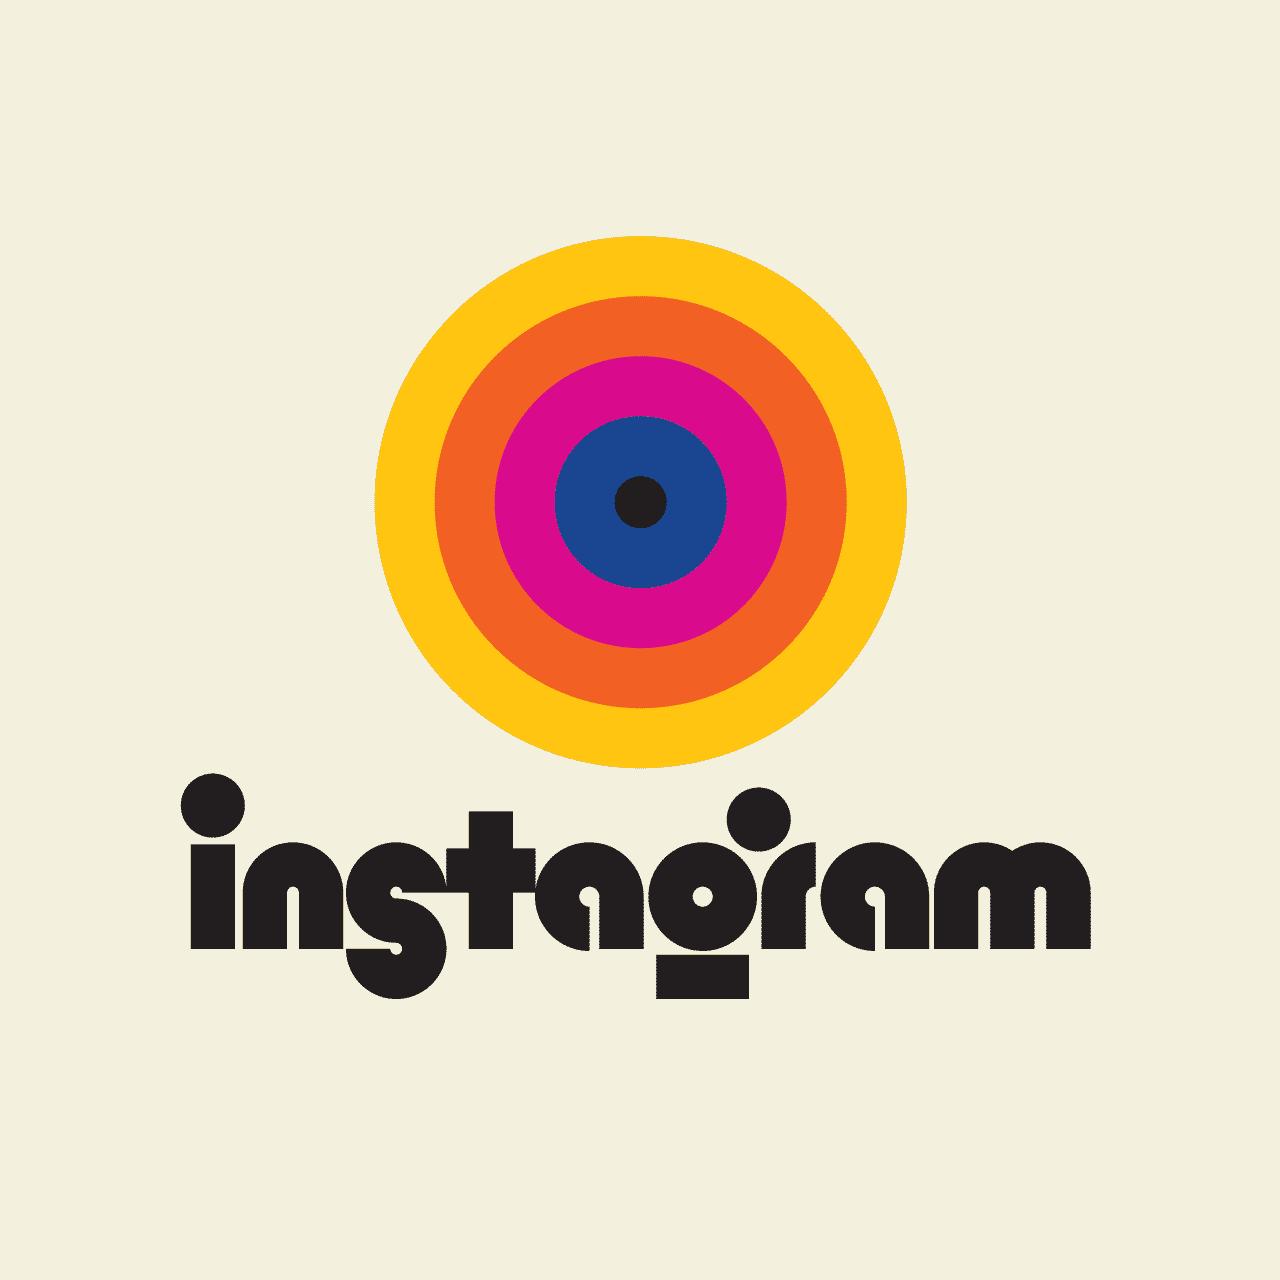 instagram vintage logo rafael serra